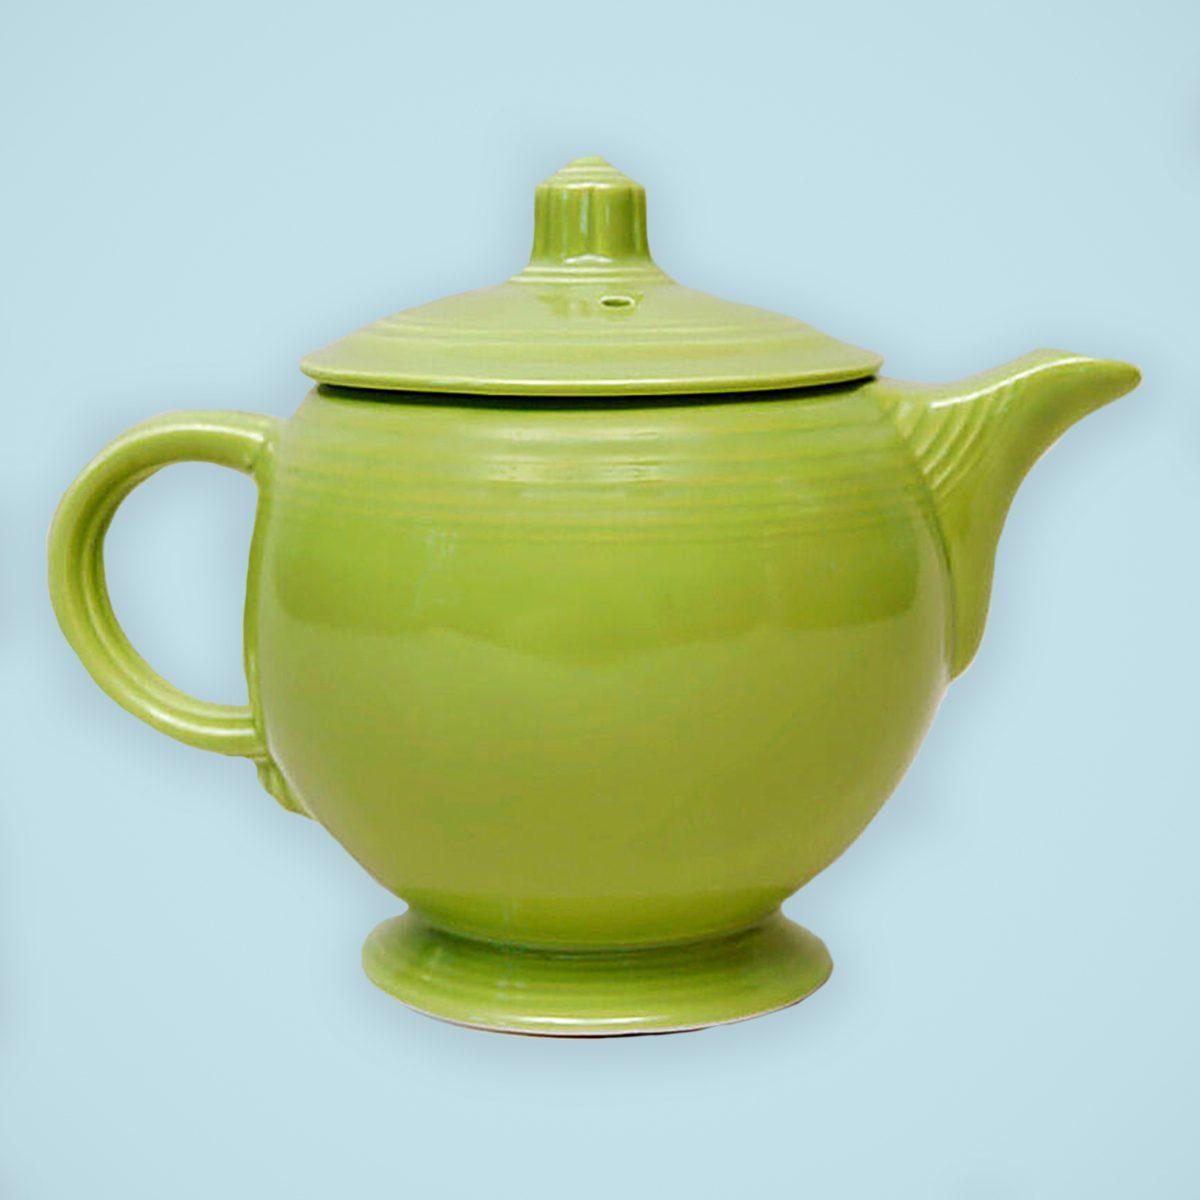 fiesta Iconic design teapot